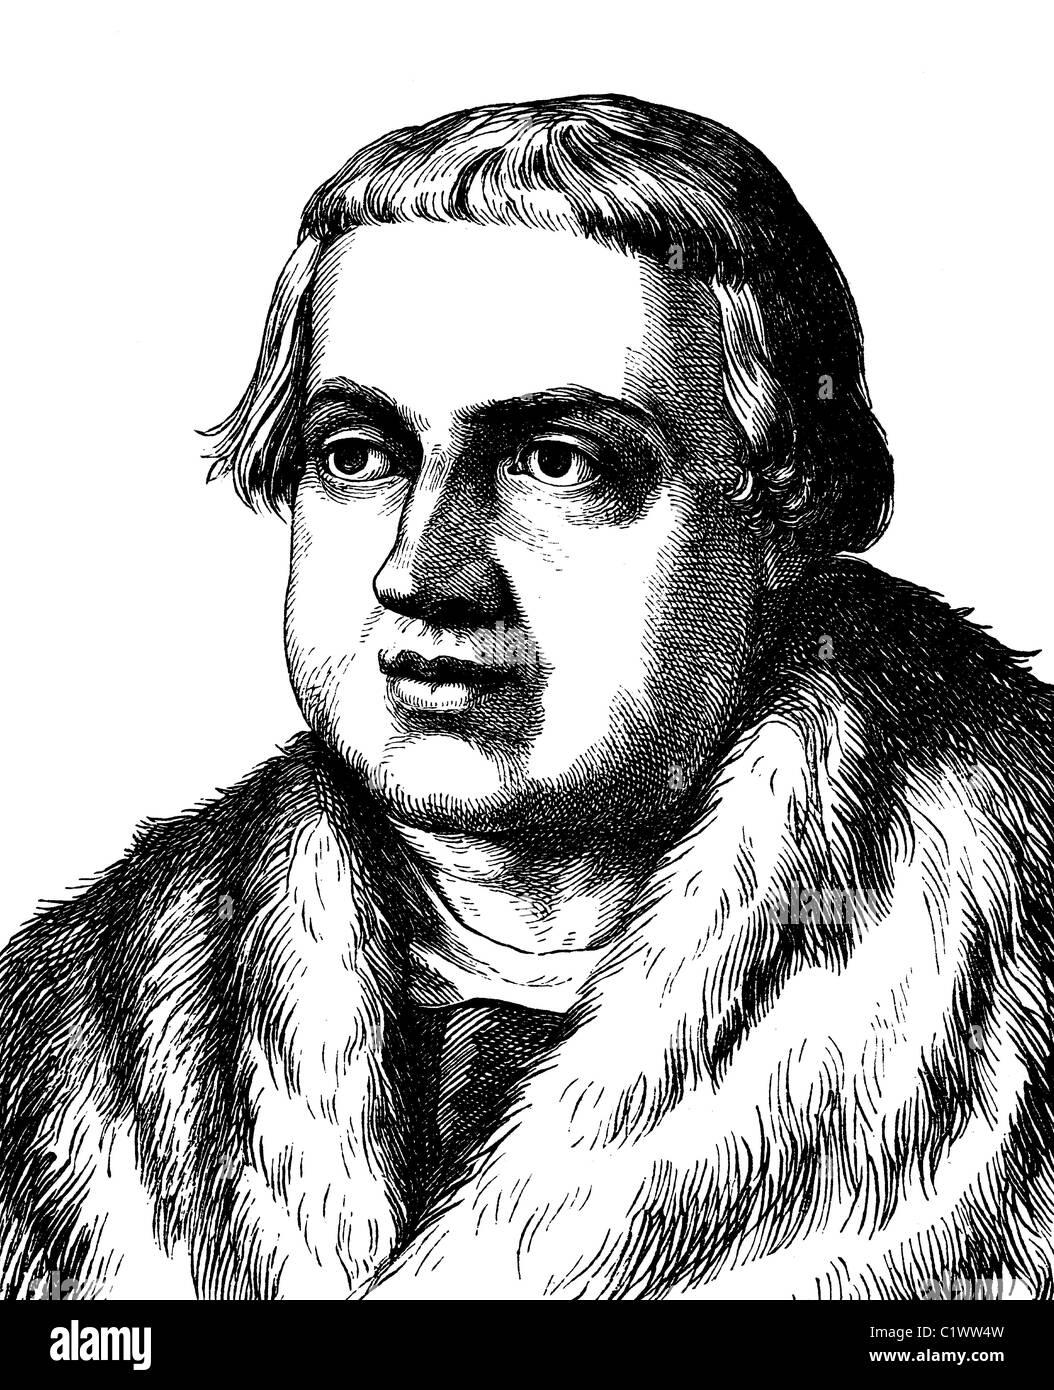 Digital improved image of Conrad Peutinger, German lawyer, 1465 - 1547, historical illustration, portrait, 1880 - Stock Image